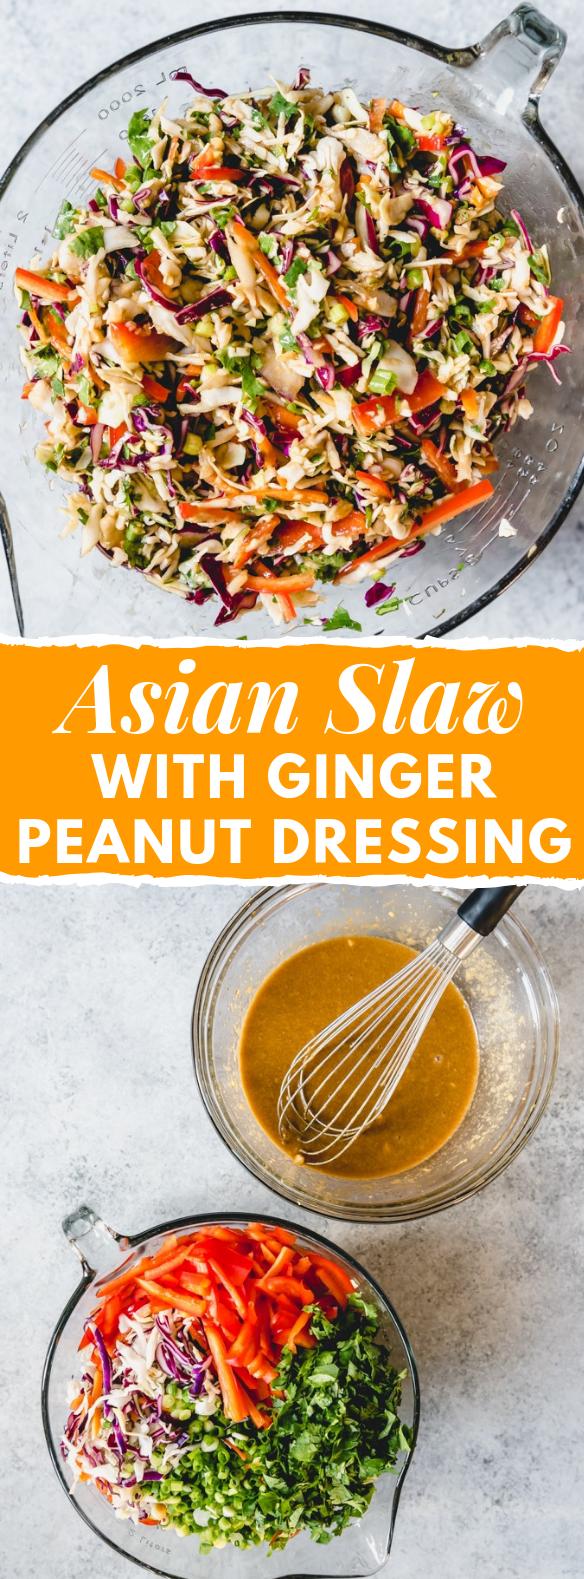 ASIAN SLAW WITH GINGER PEANUT DRESSING #salad #vegetarian